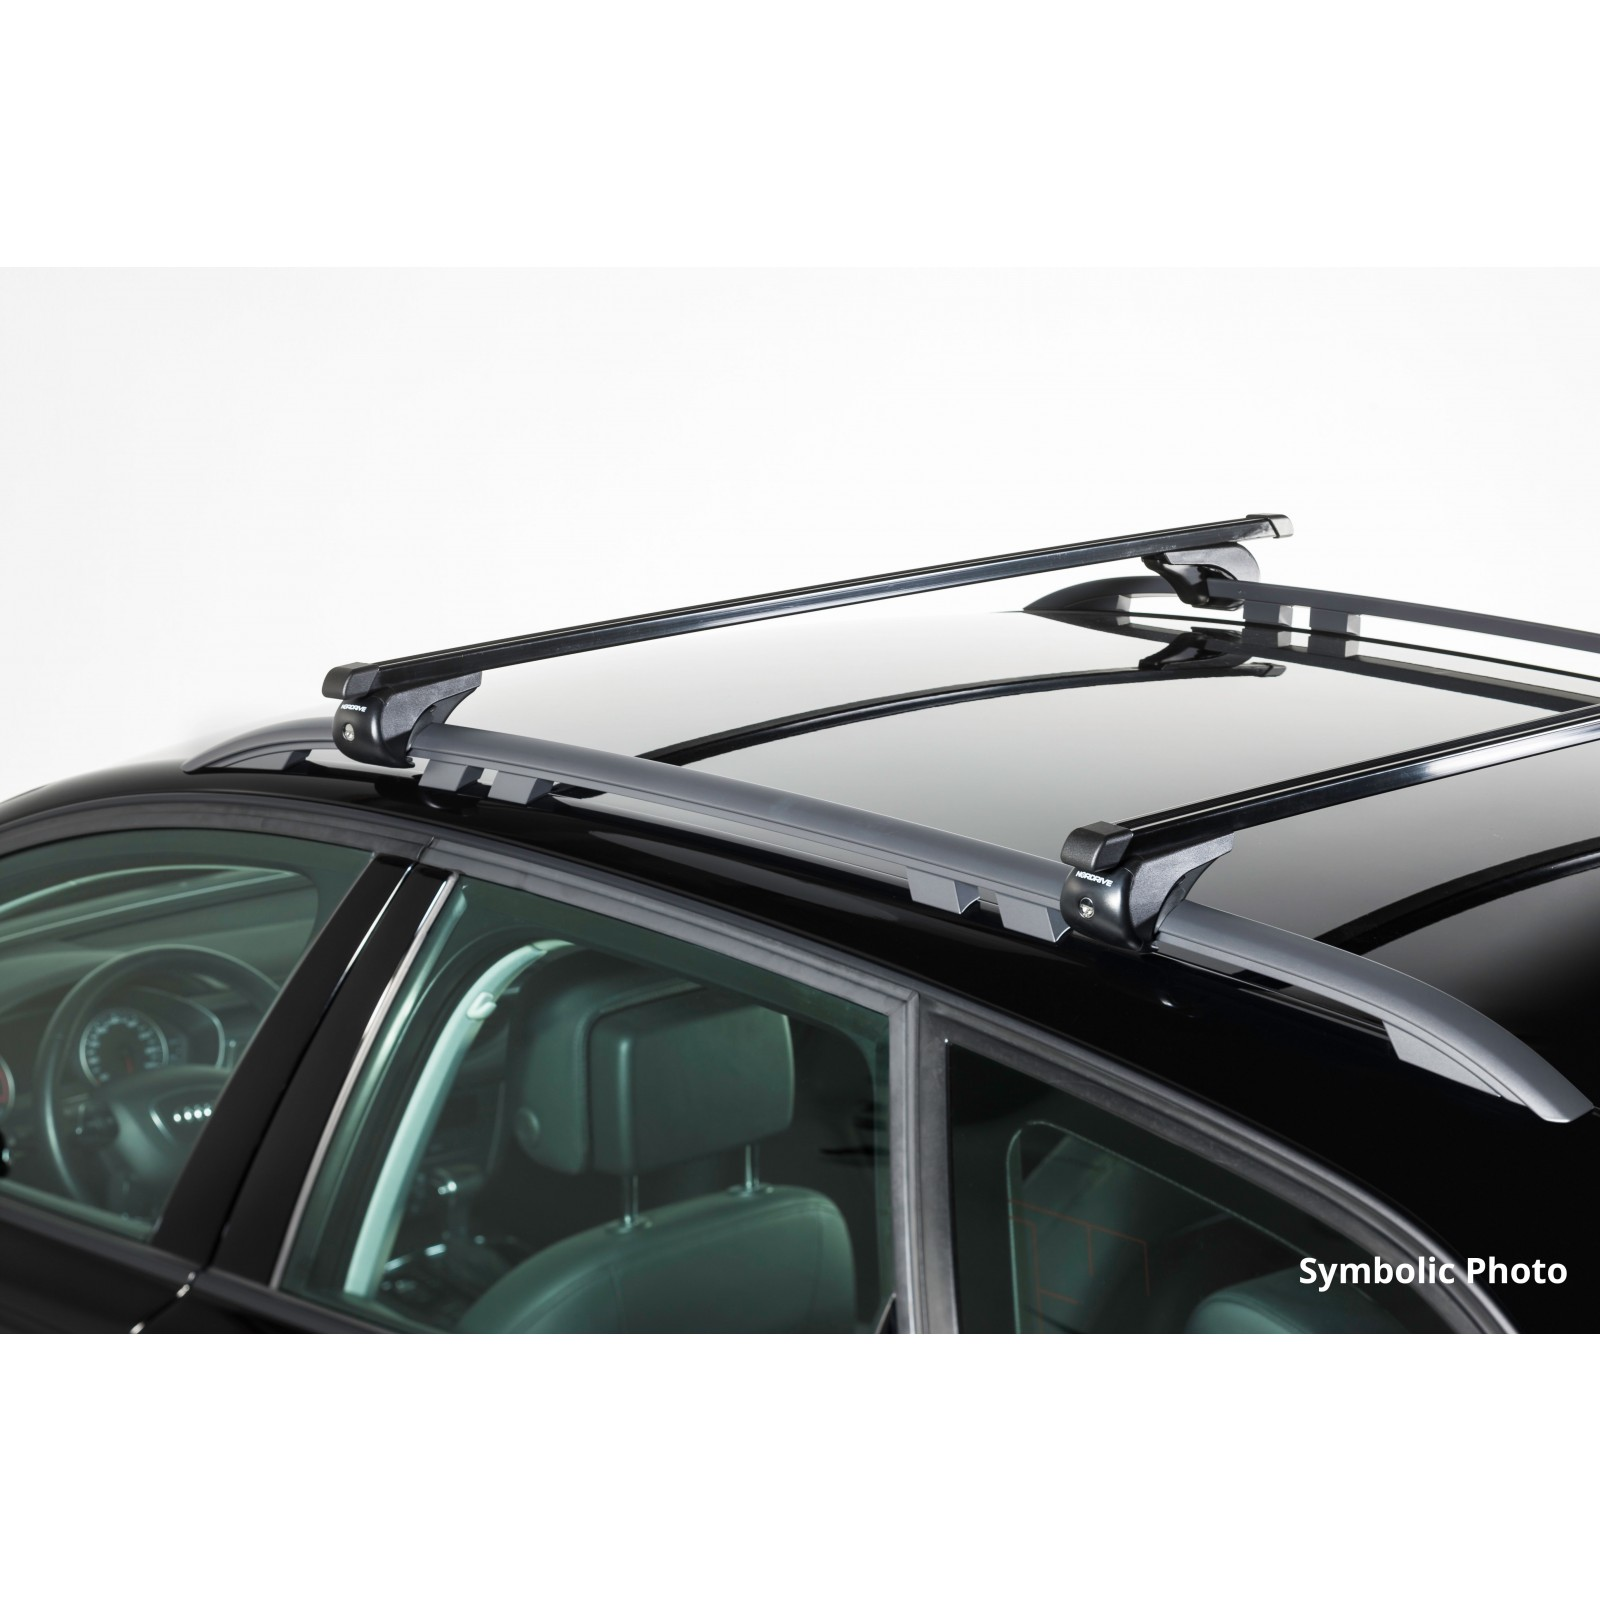 barres de toit en acier pour volkswagen tiguan 120cm. Black Bedroom Furniture Sets. Home Design Ideas